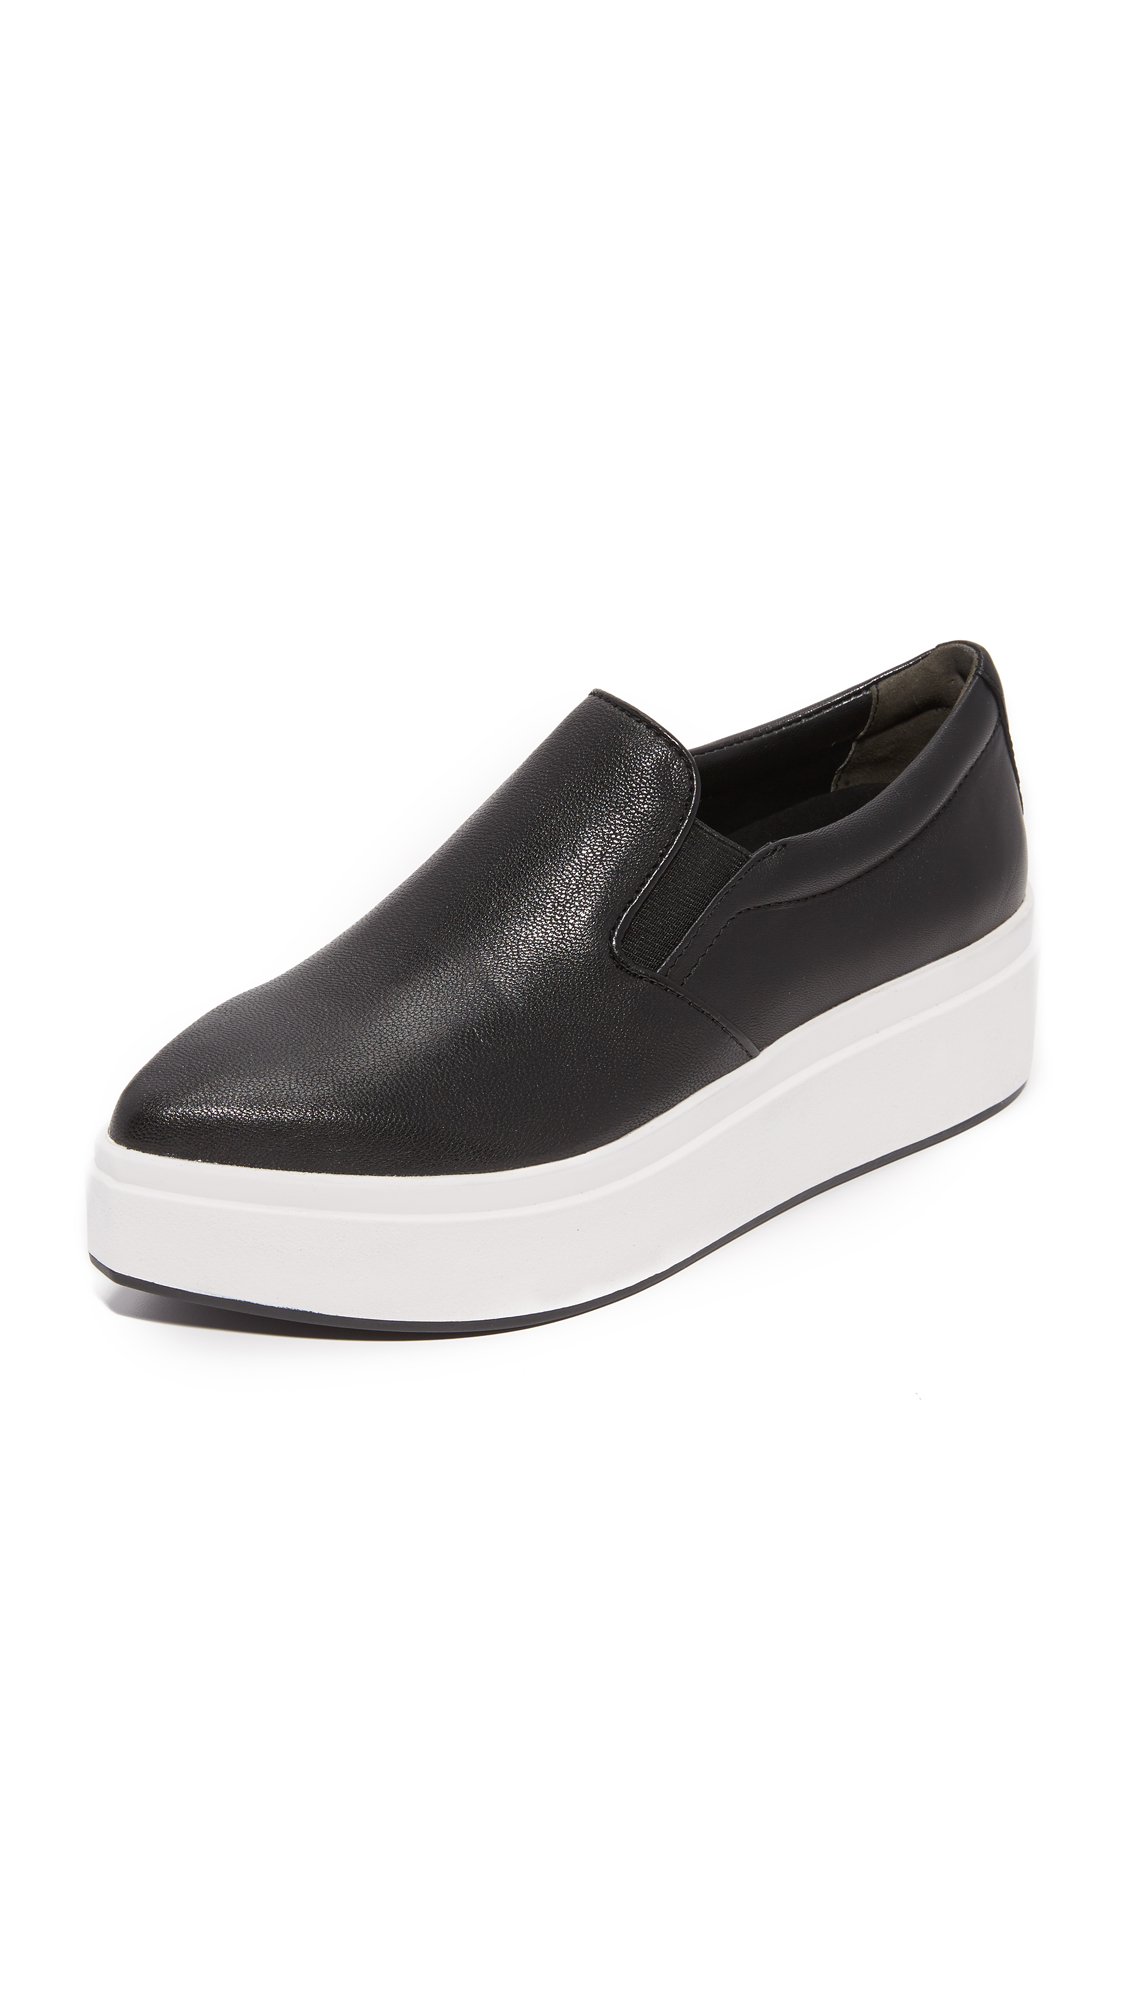 Dkny Trey Platform Slip On Sneakers - Black at Shopbop